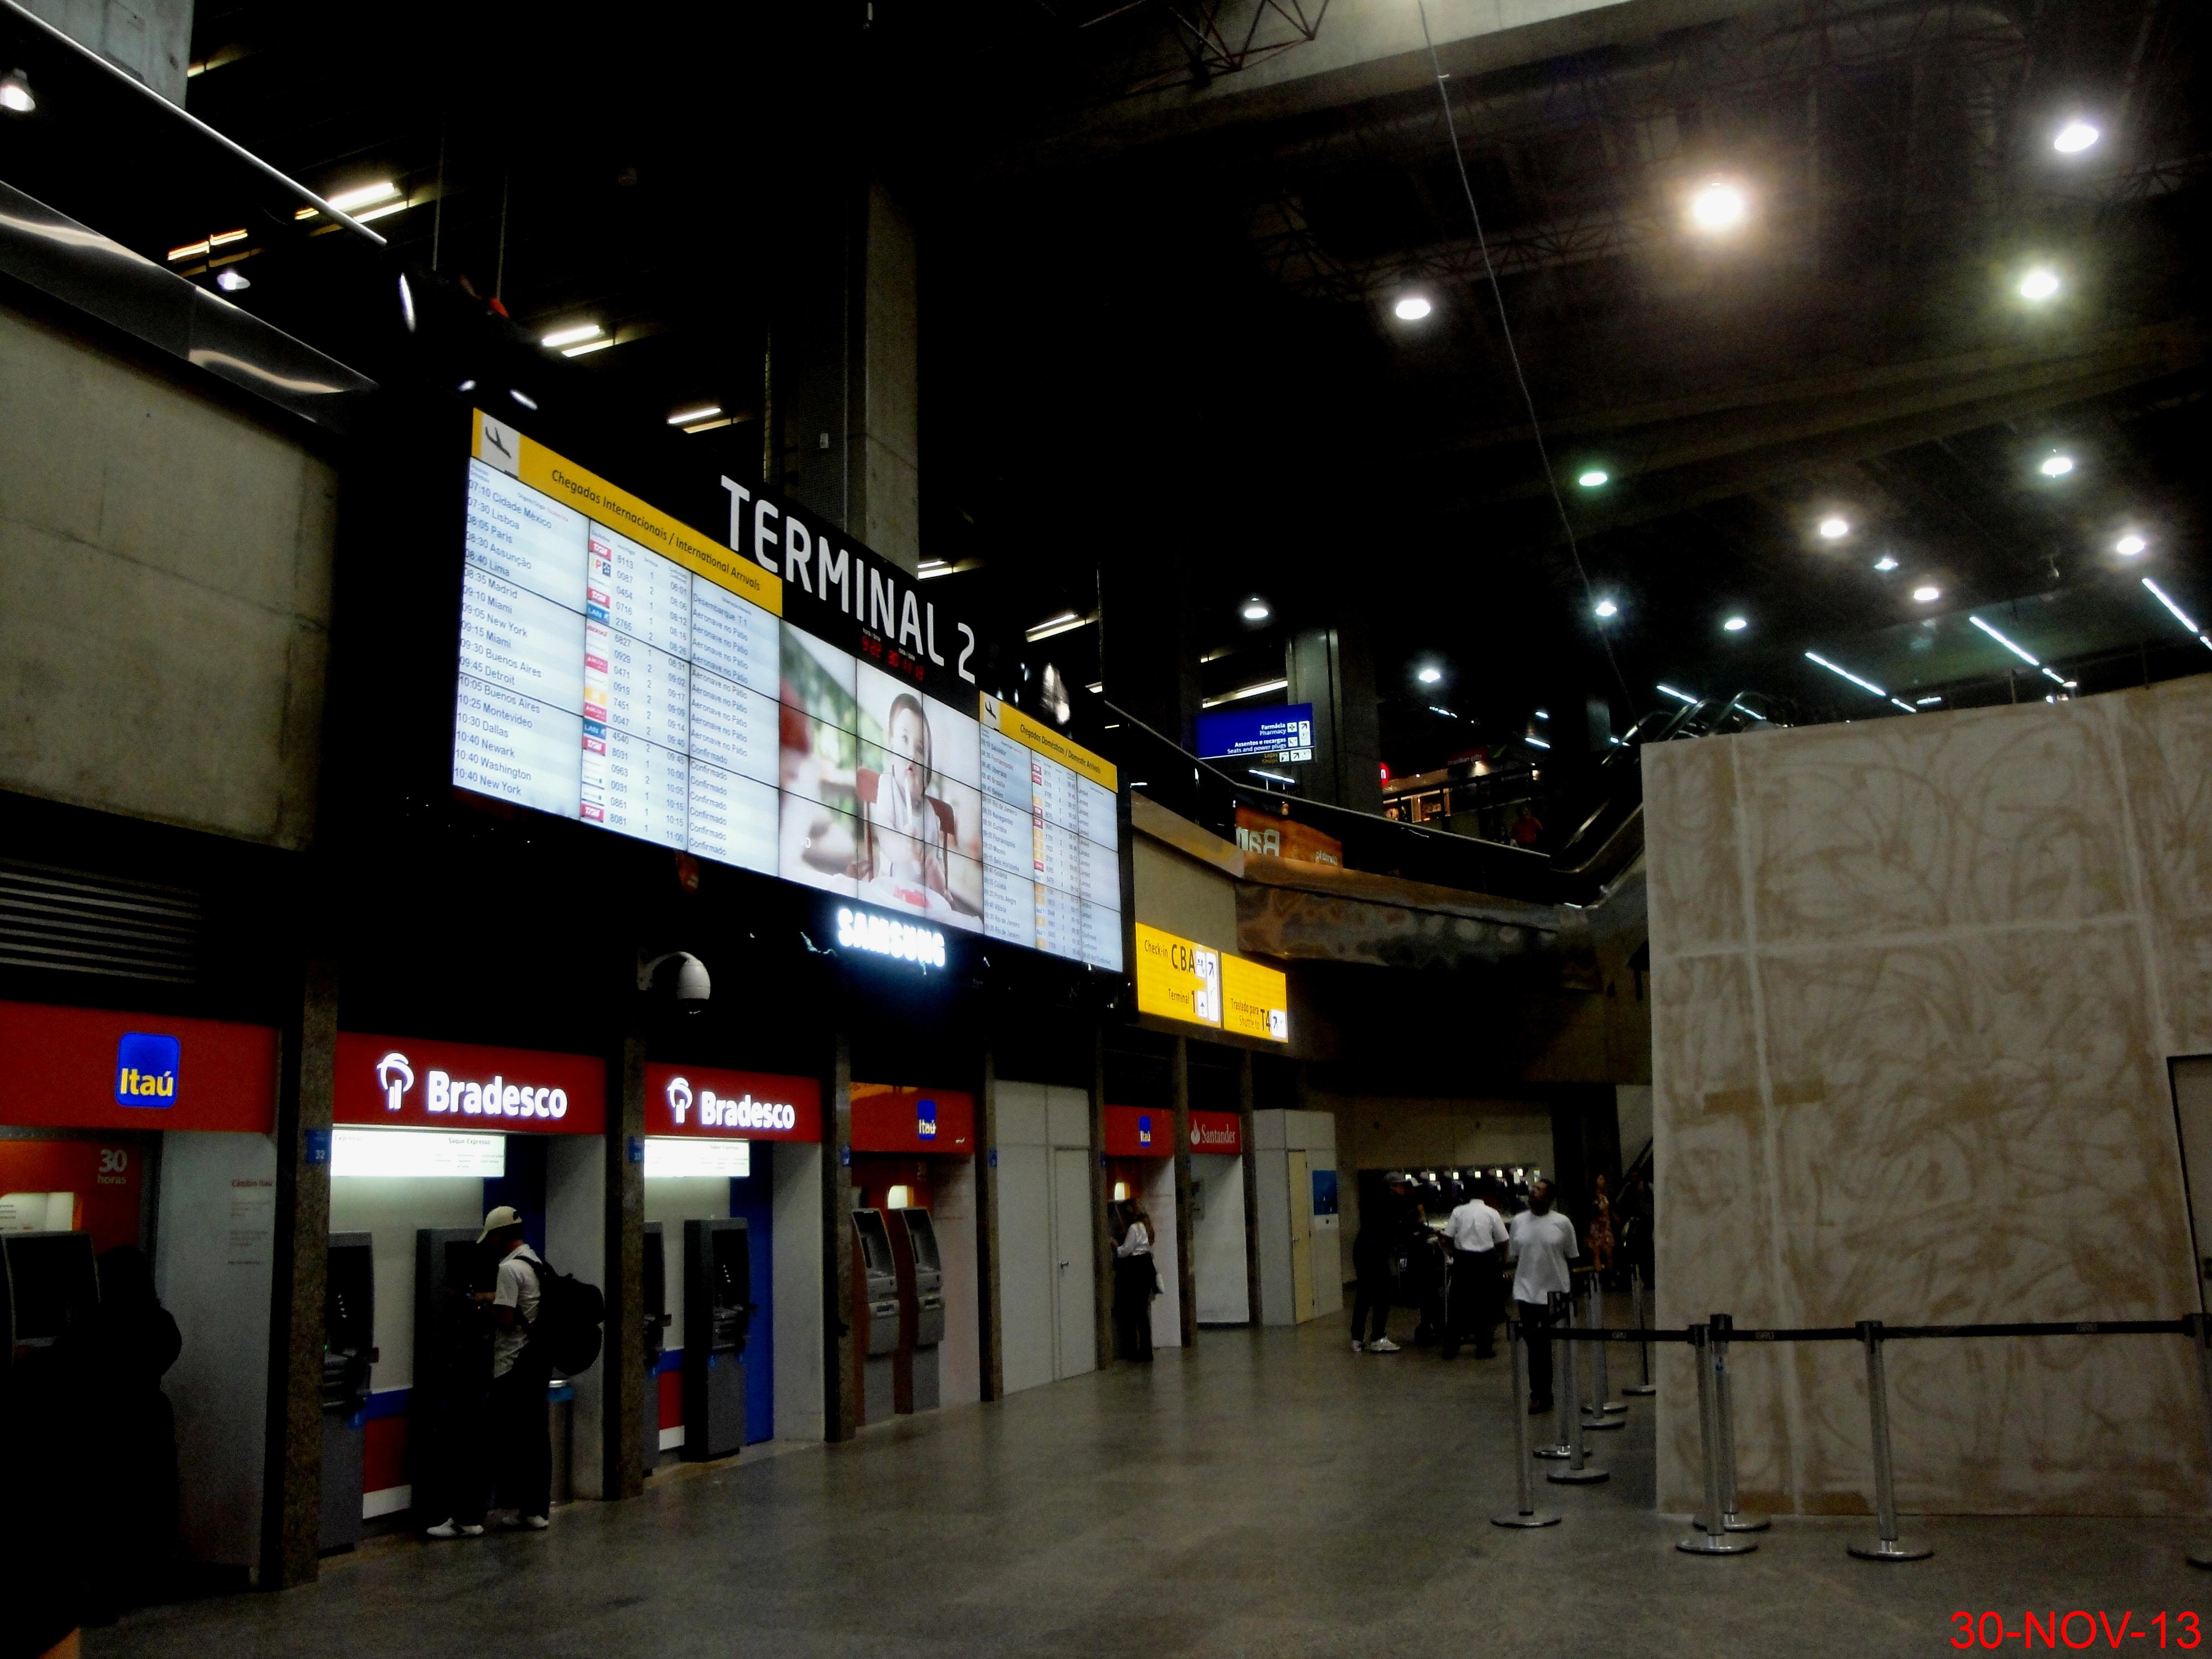 Aeroporto Gru : File caixas eletrônicos no terminal do aeroporto internacional